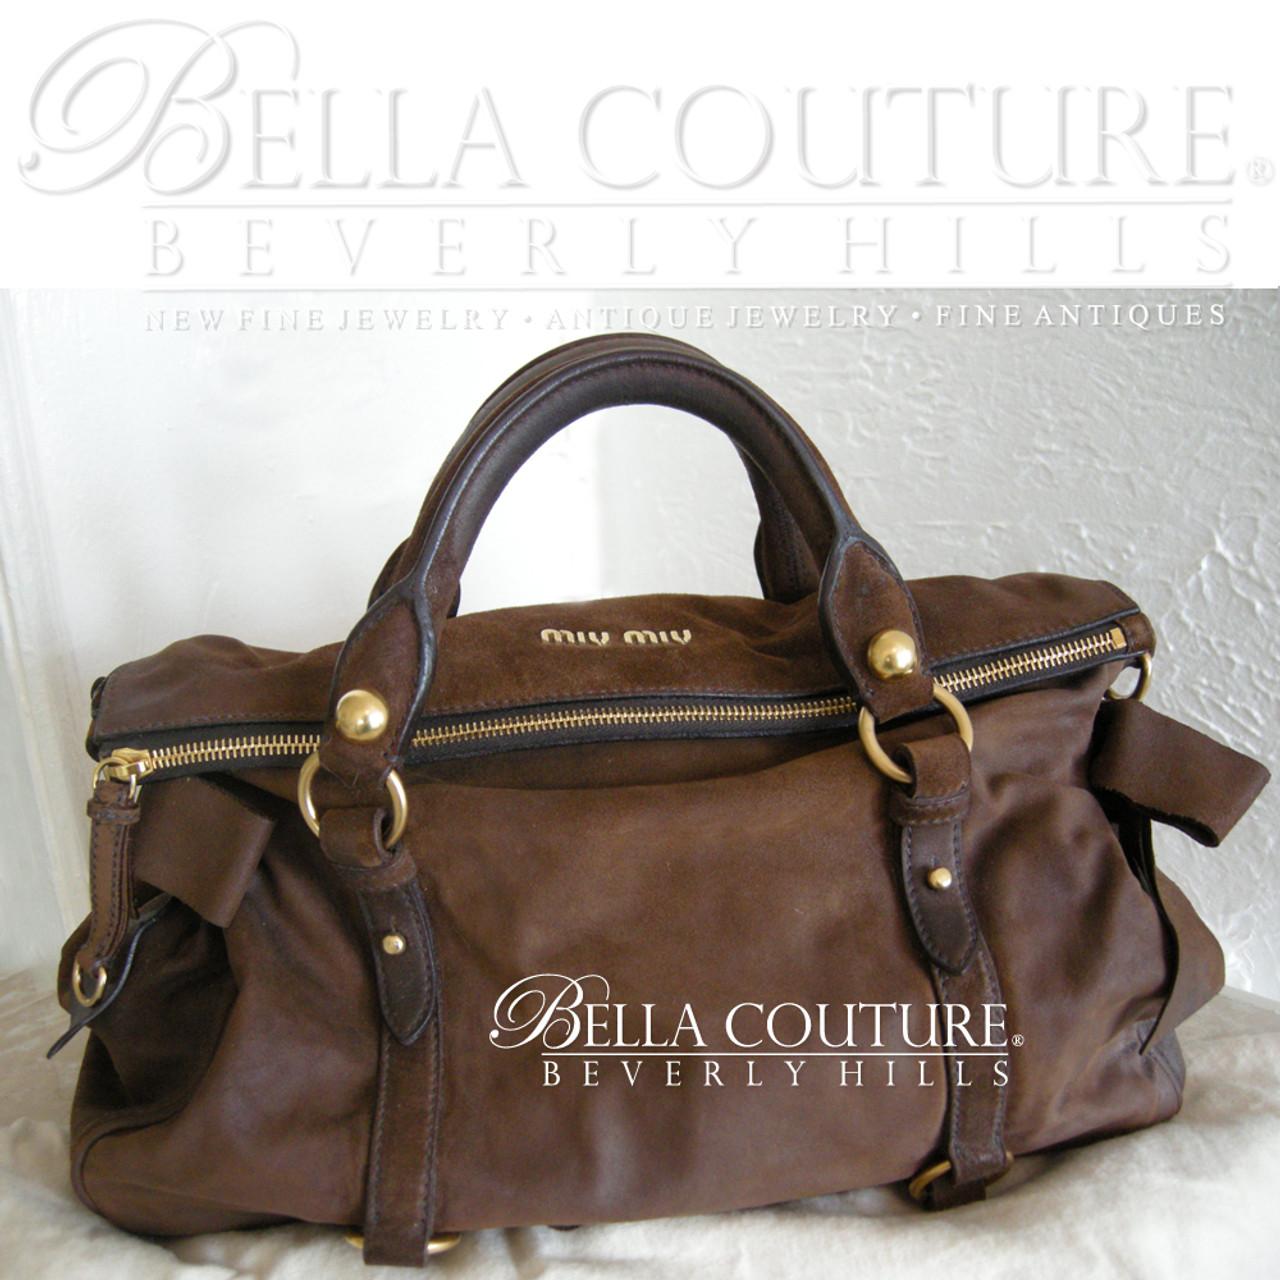 3ee2d08c26bc Bella Couture Bellacouture Miu miu bow suede handbag bag purse tote 254  76747  18566.1352843003.jpg c 2 imbypass on